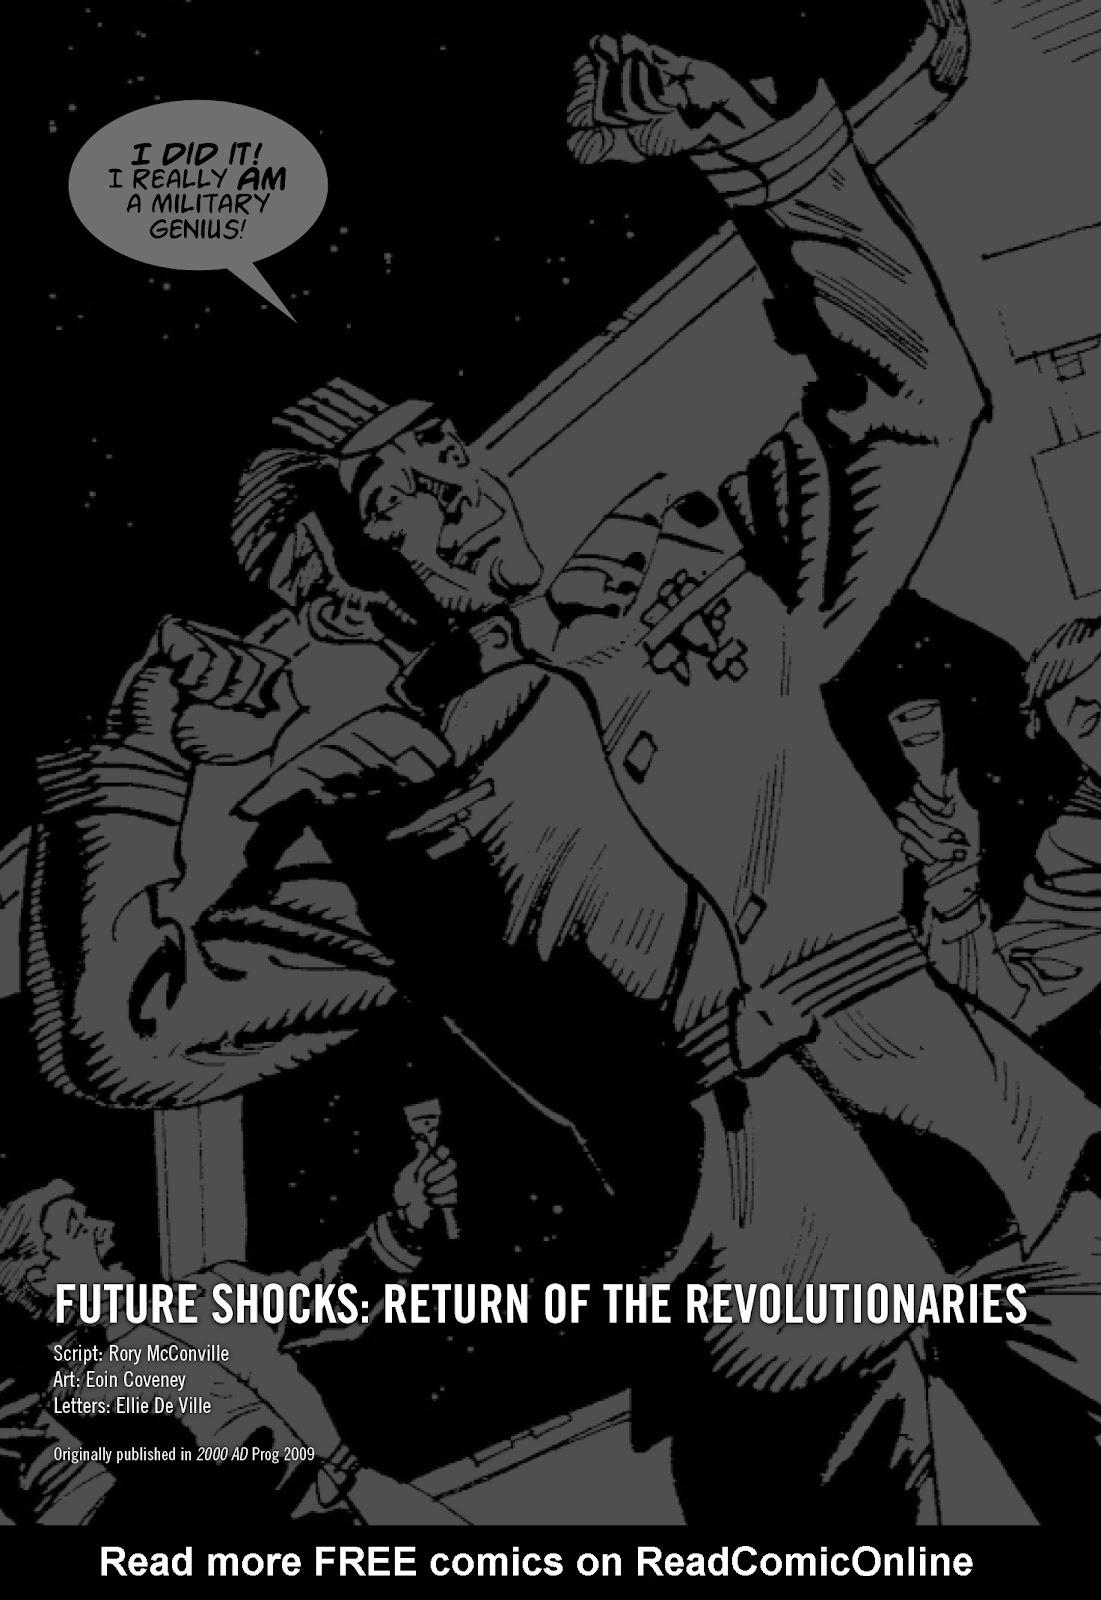 Judge Dredd Megazine (Vol. 5) issue 427 - Page 114